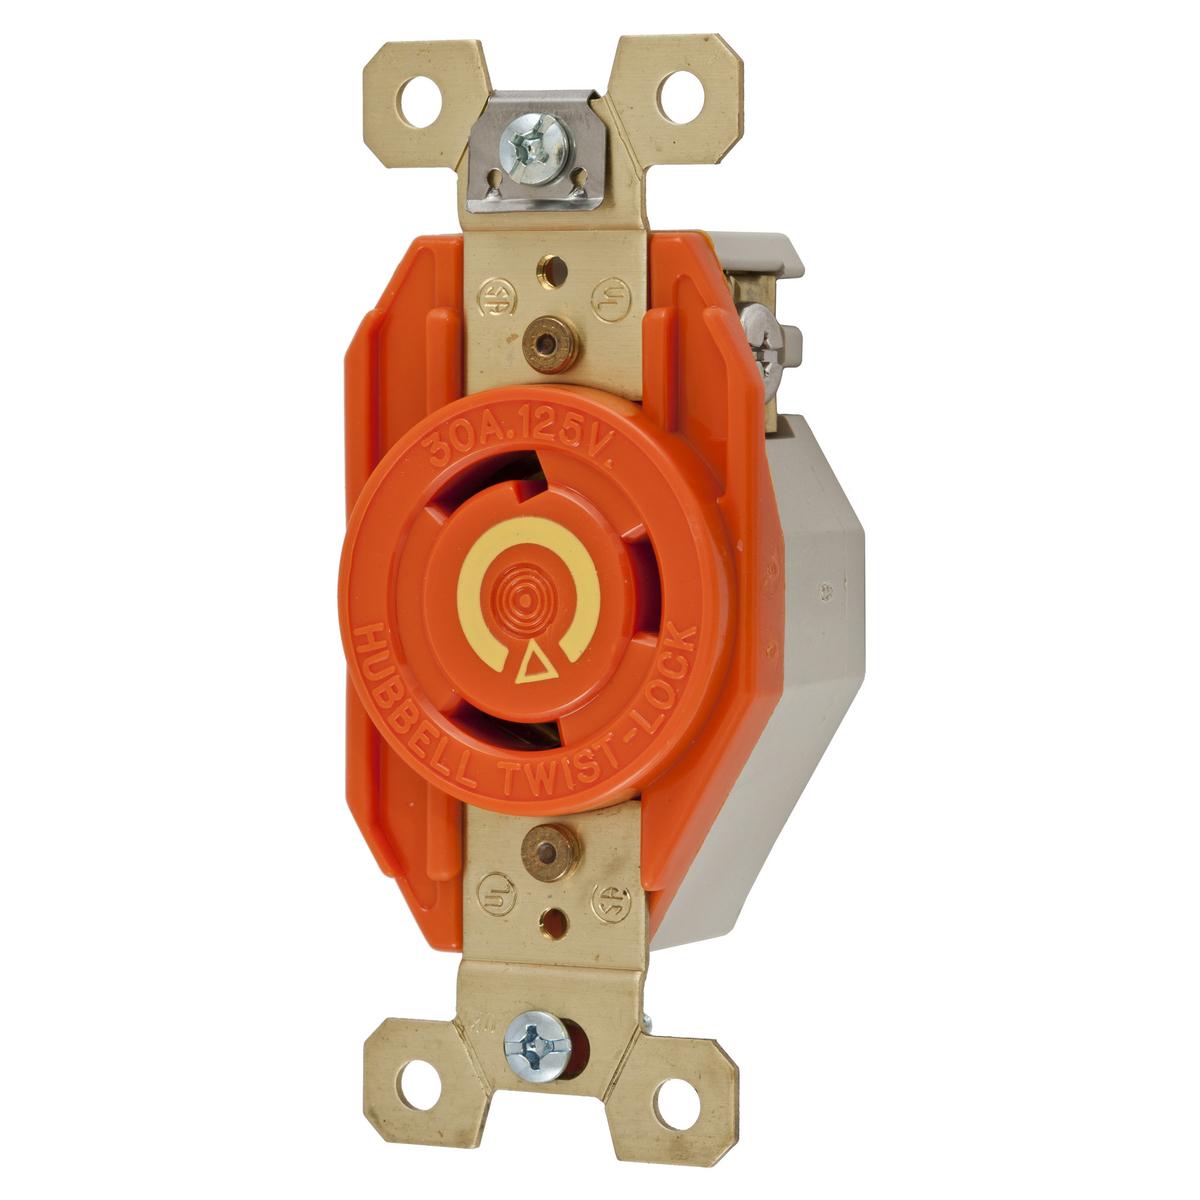 Hubbell IG2610 30 Amp 125 Volt 2-Pole 3-Wire NEMA L5-30R Orange Isolated Ground Locking Single Receptacle